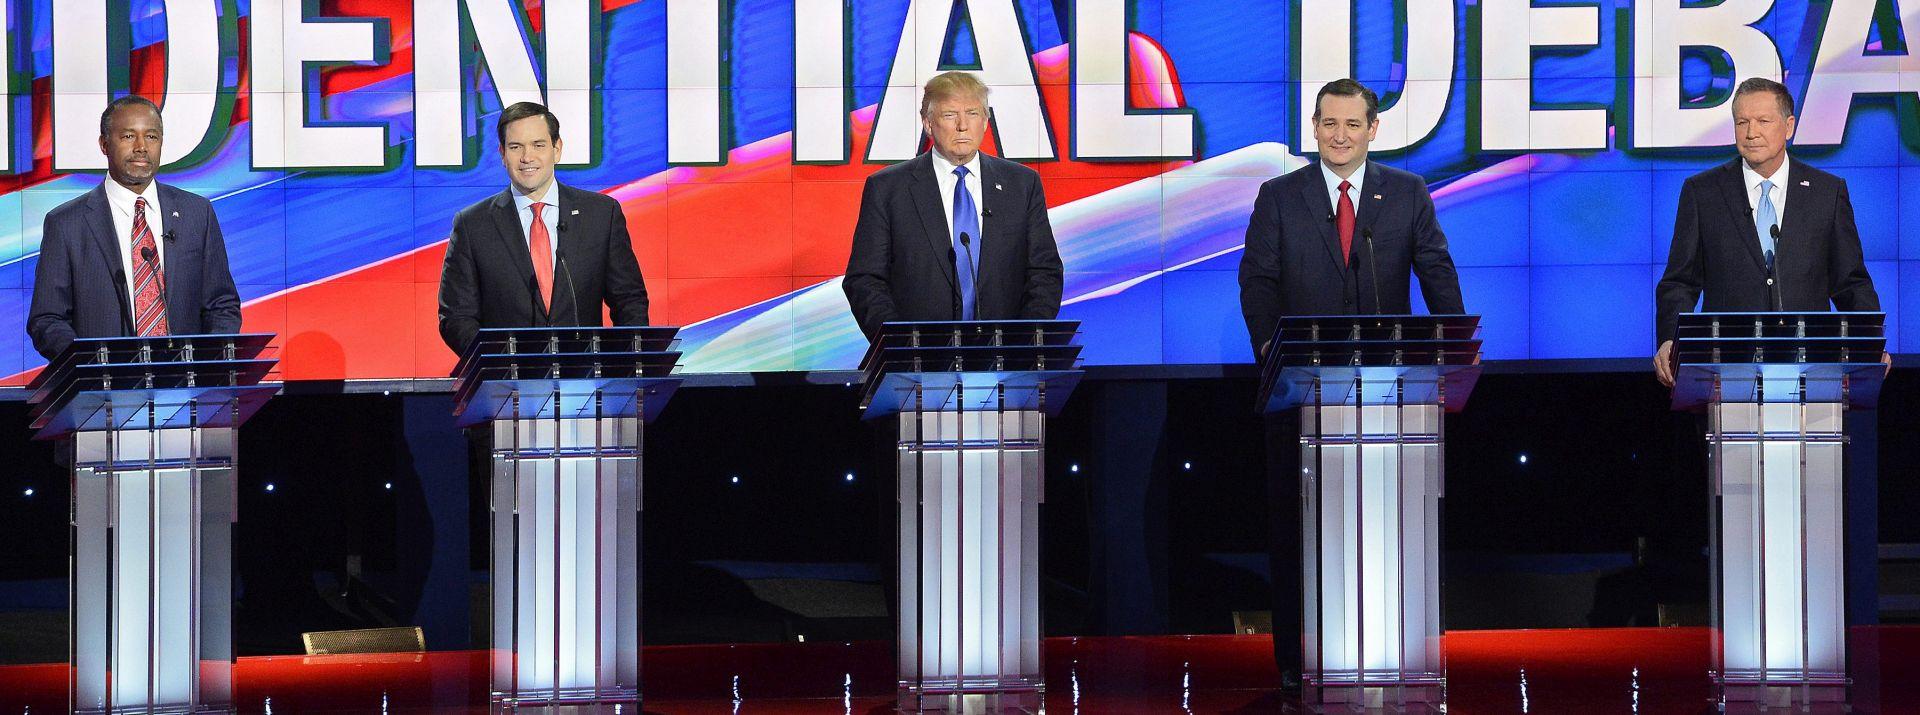 """Veliki Donald"" na debati pod paljbom ""malog Marca"" i ostalih suparnika"